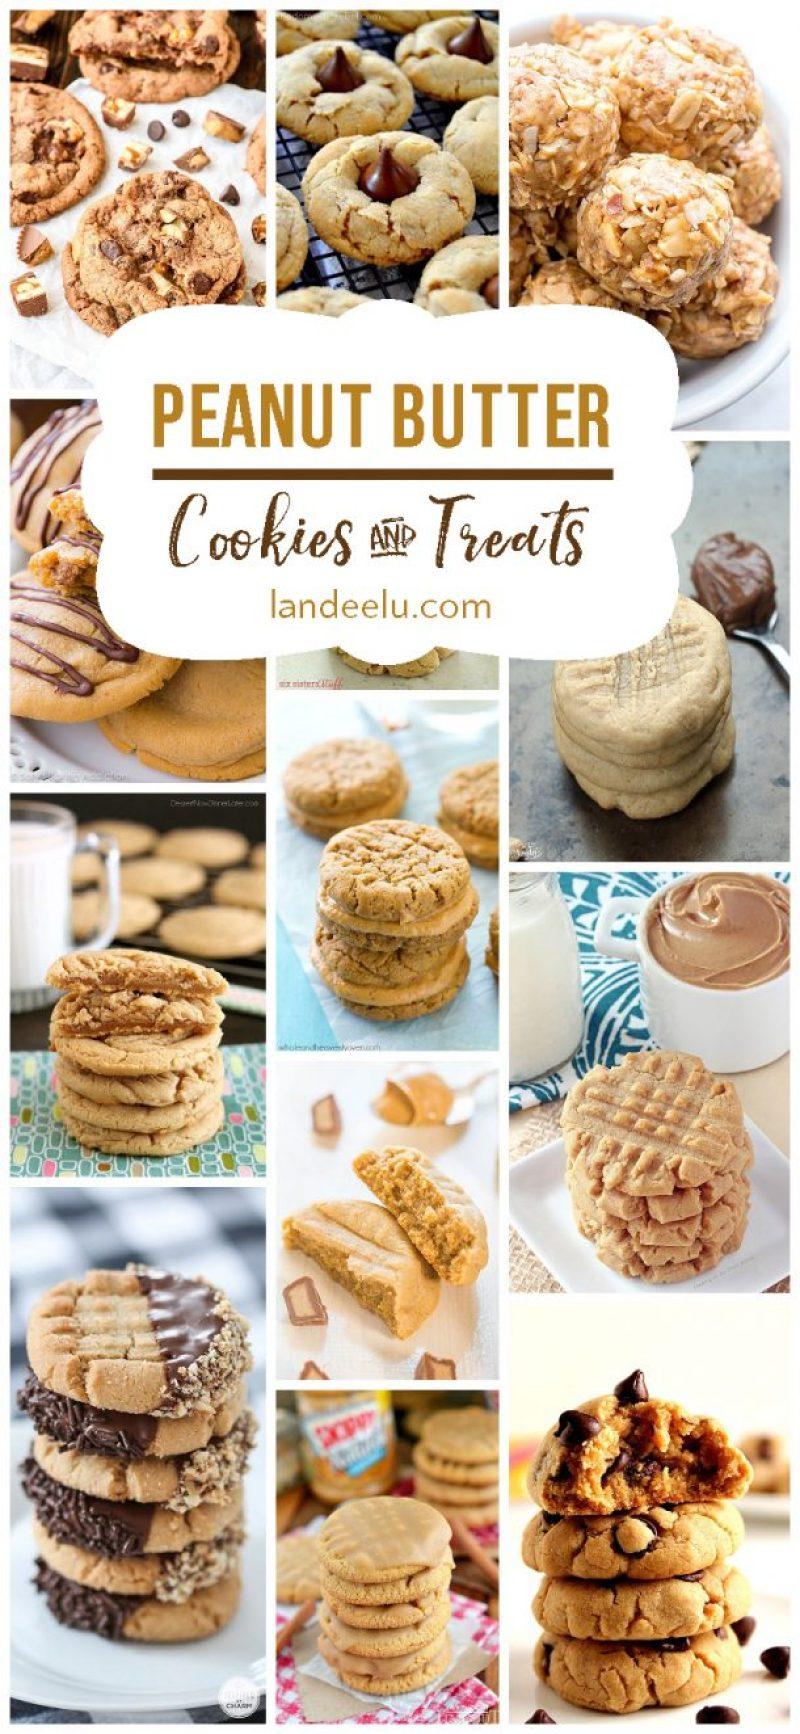 Peanut Butter Cookie Recipe Round Up